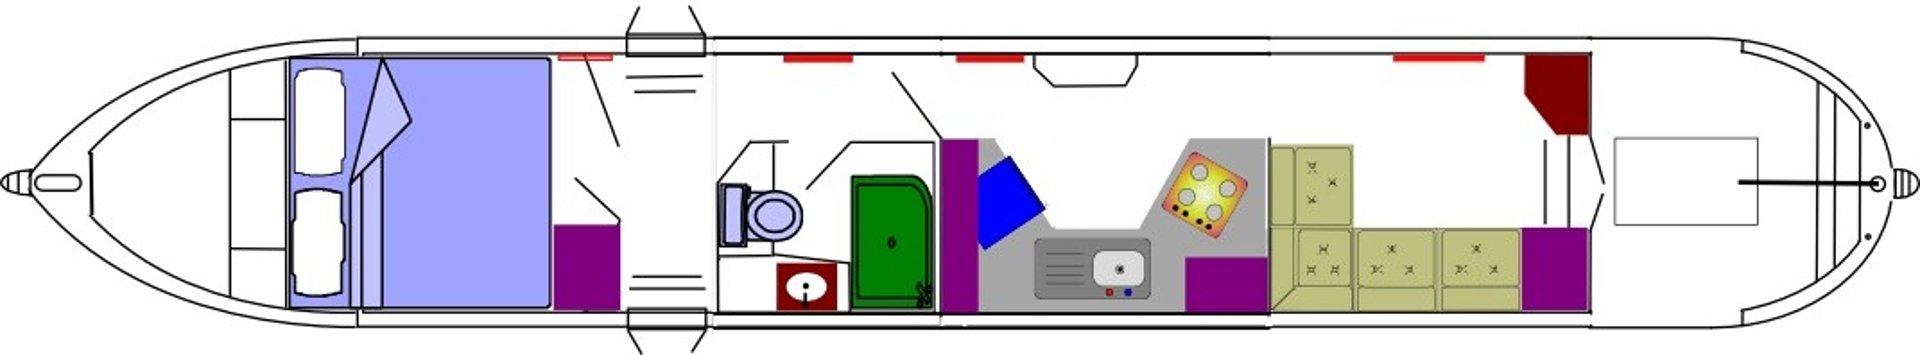 Sophia layout 1